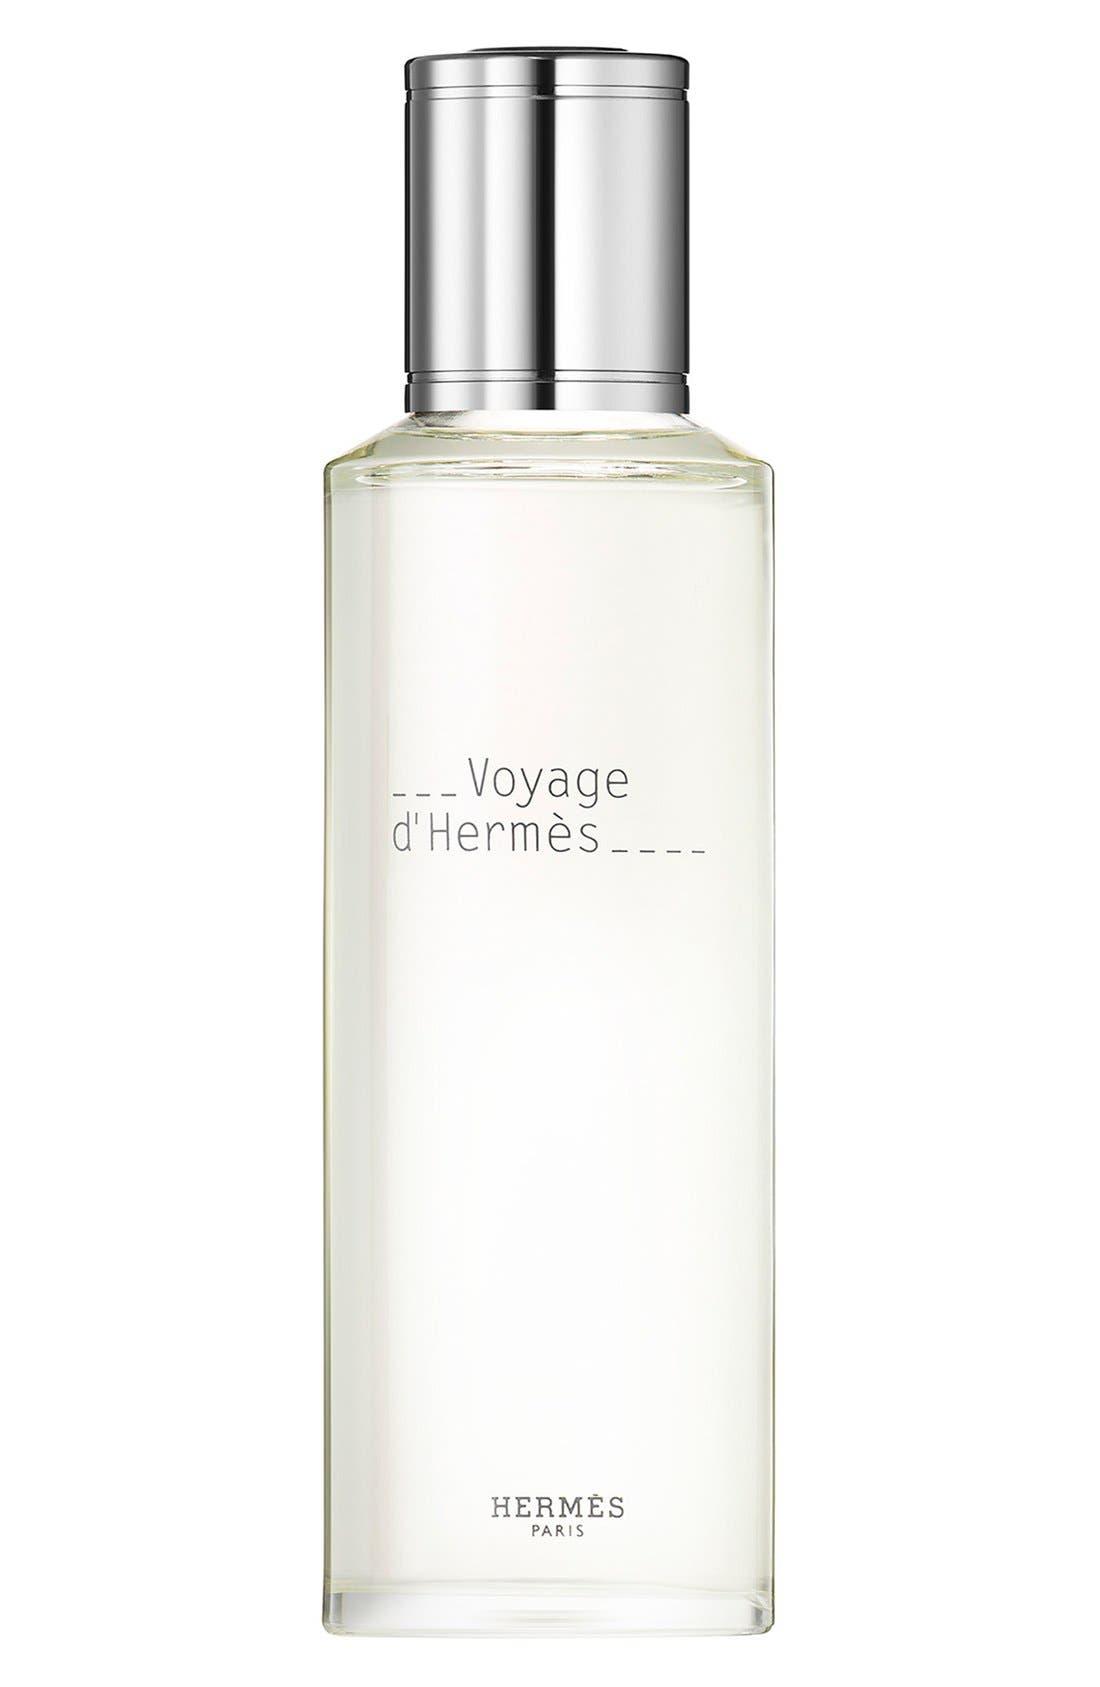 Hermès Voyage d'Hermès - Pure perfume refill